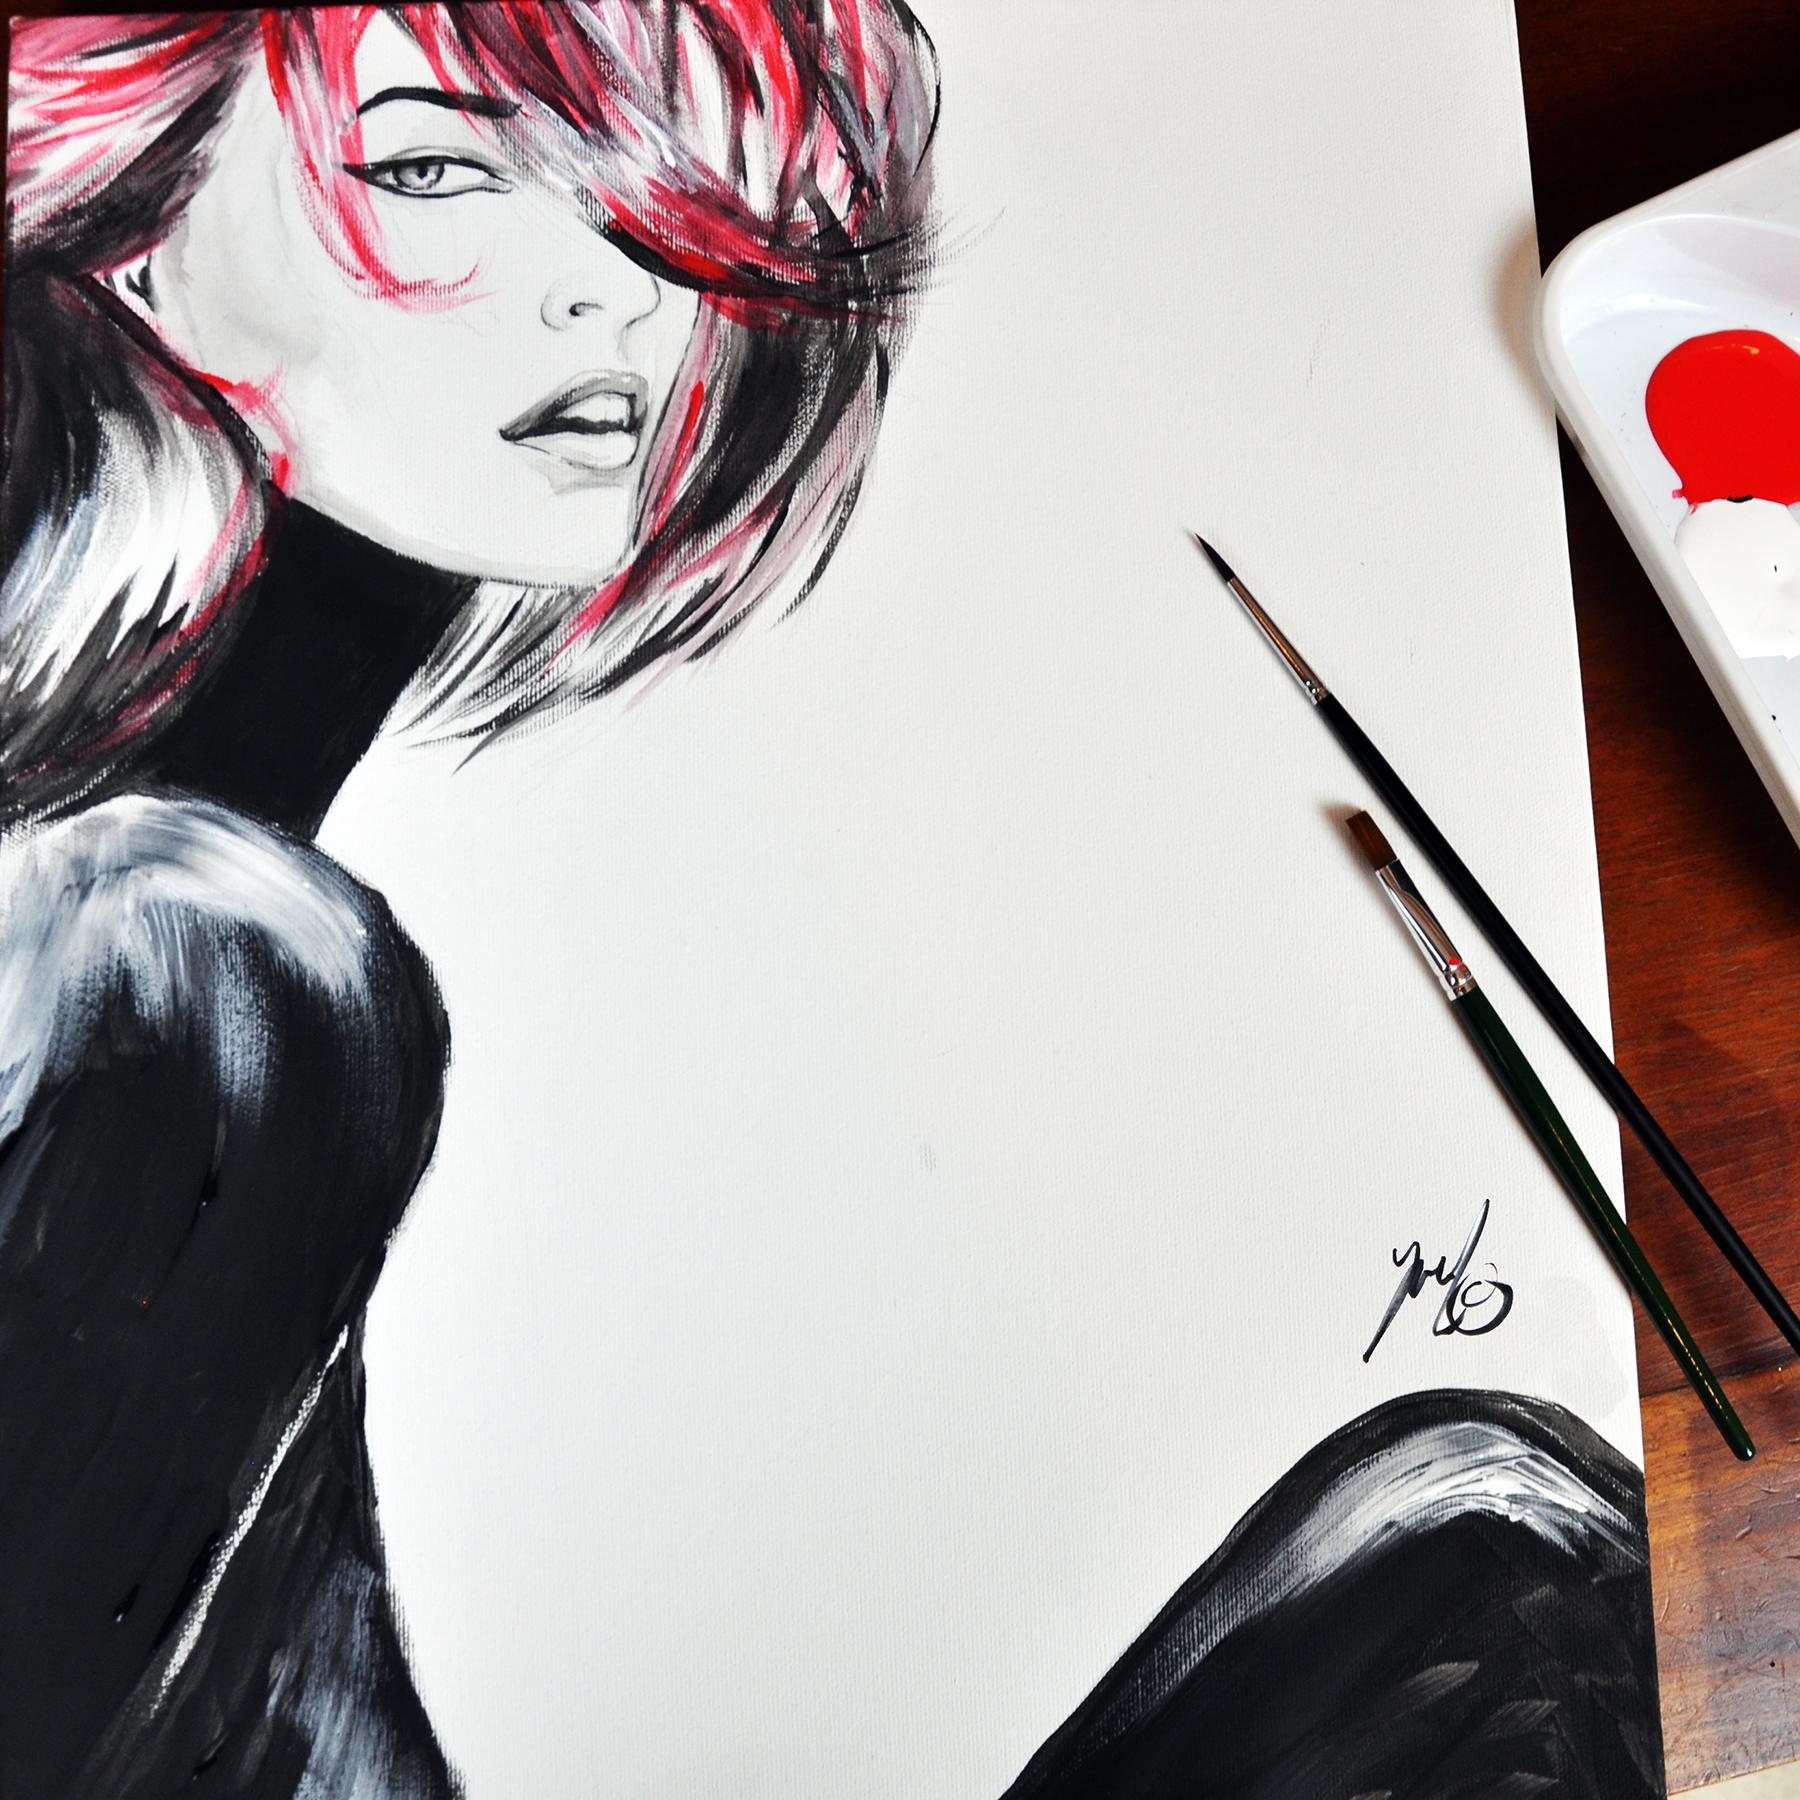 modebranche ortsunabhängig arbeiten Illustration Yael Hertzog